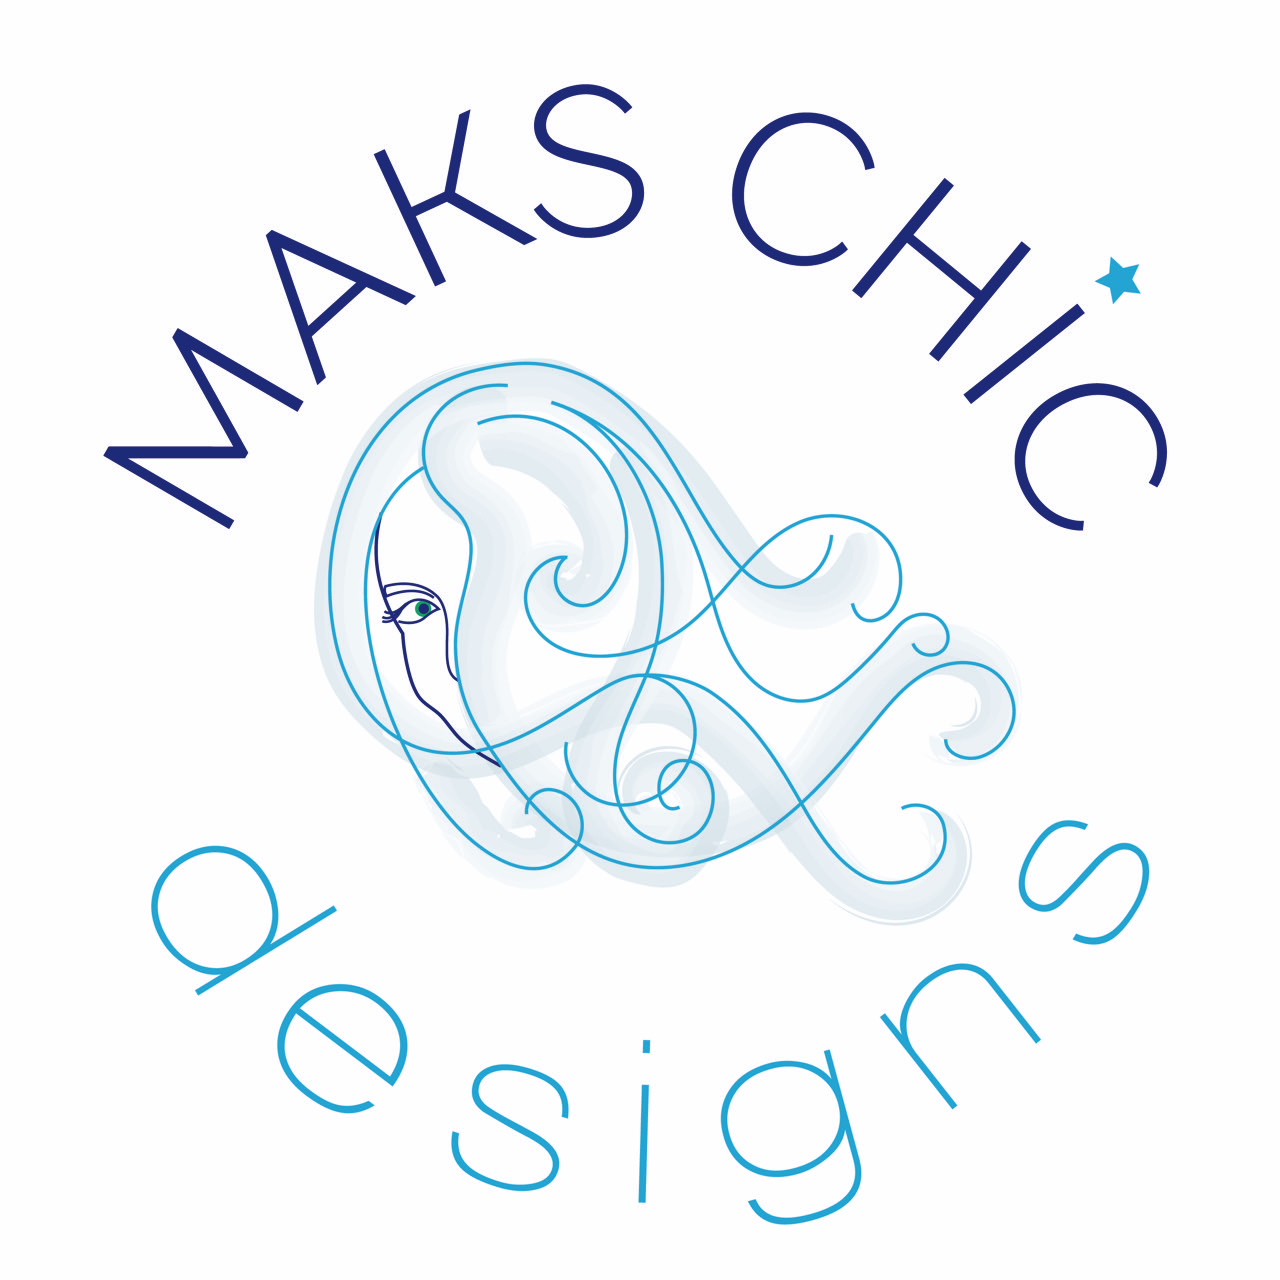 Maks Chic Design